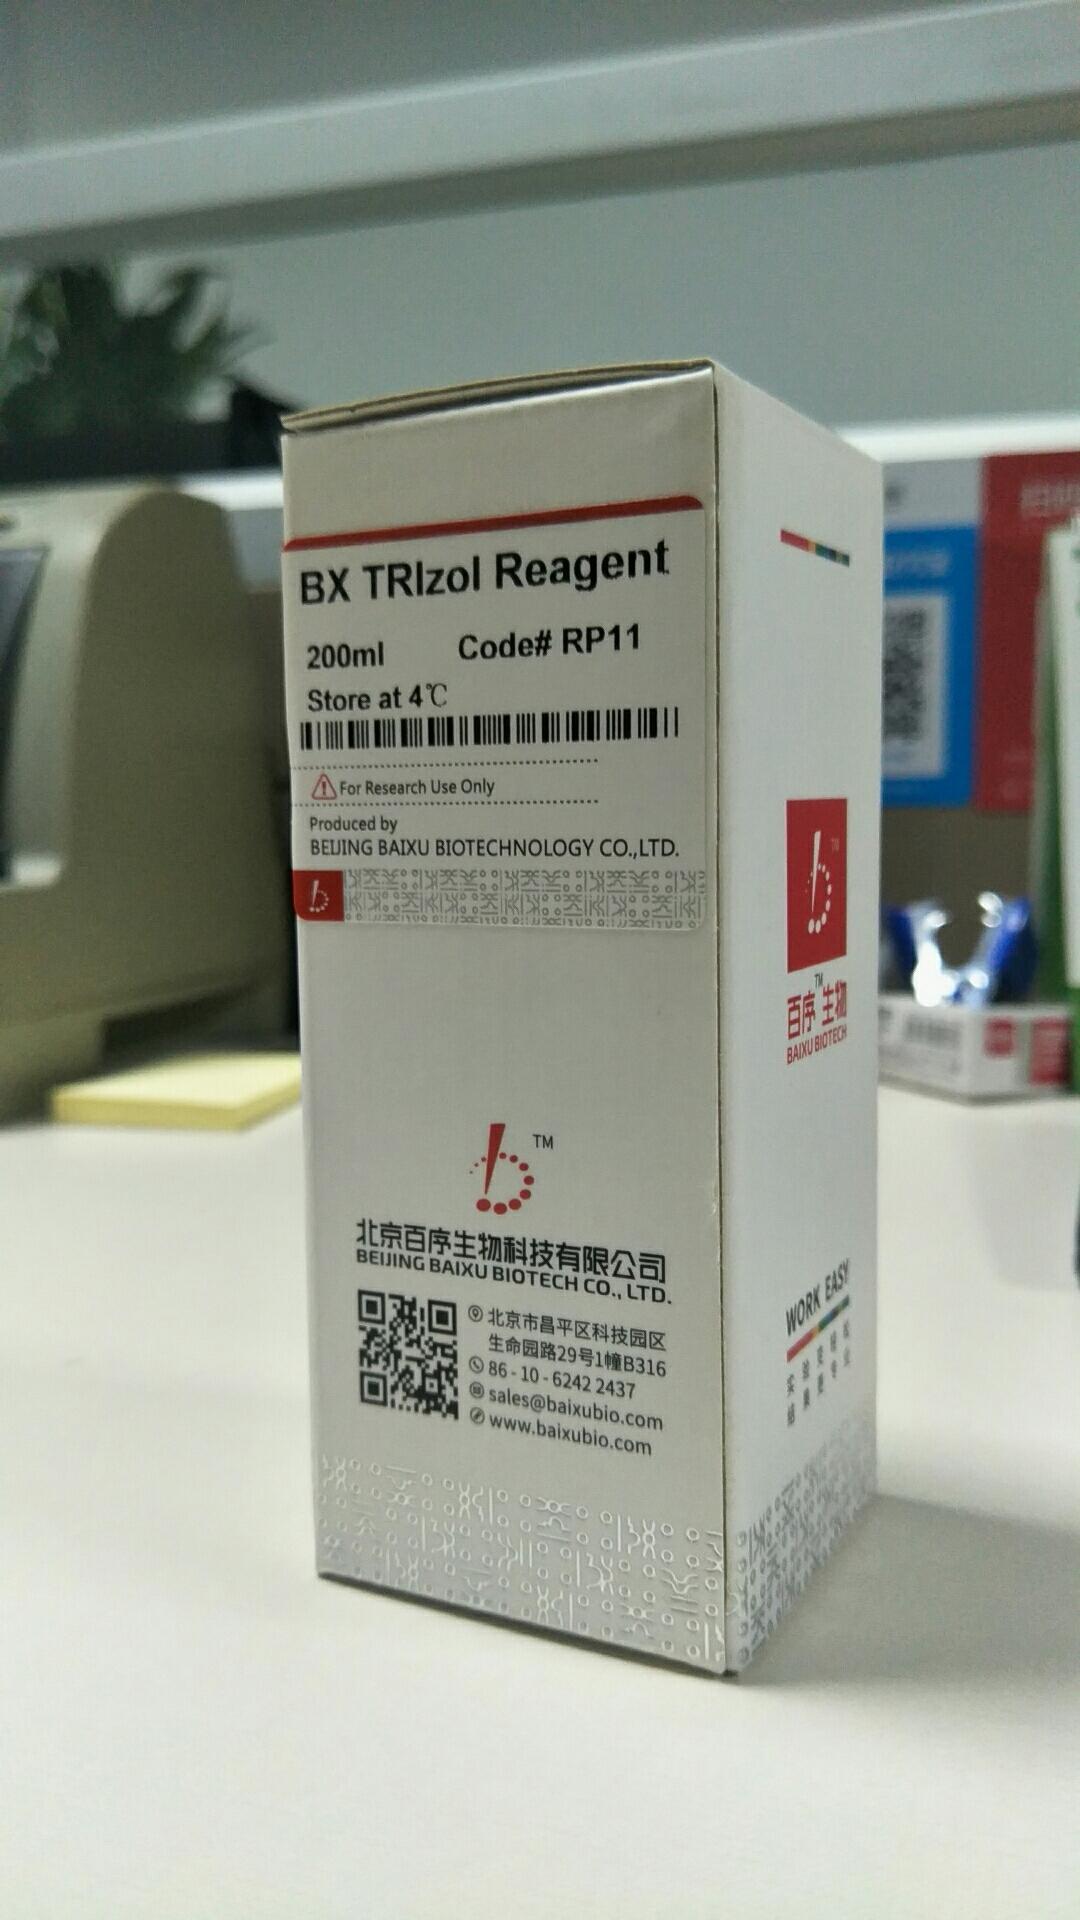 BX TRIzol Reagent (200ml)